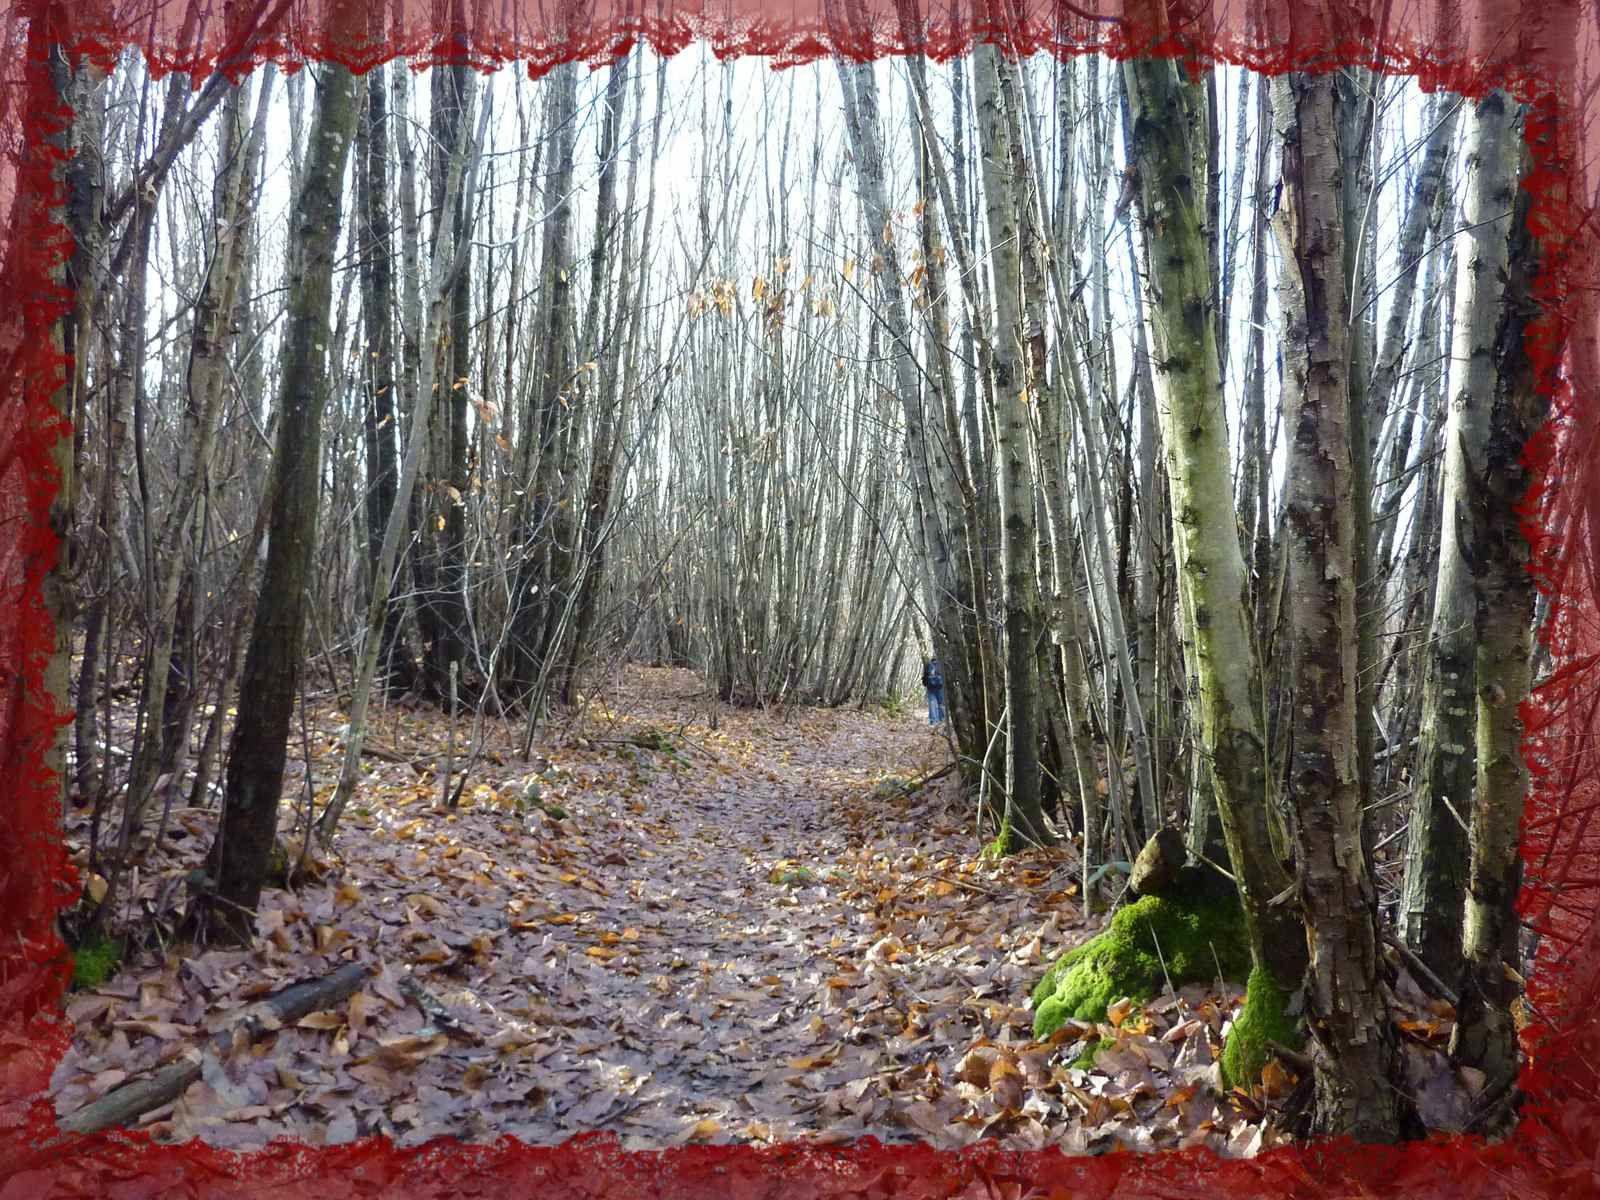 Sentier de découverte de Dignac.